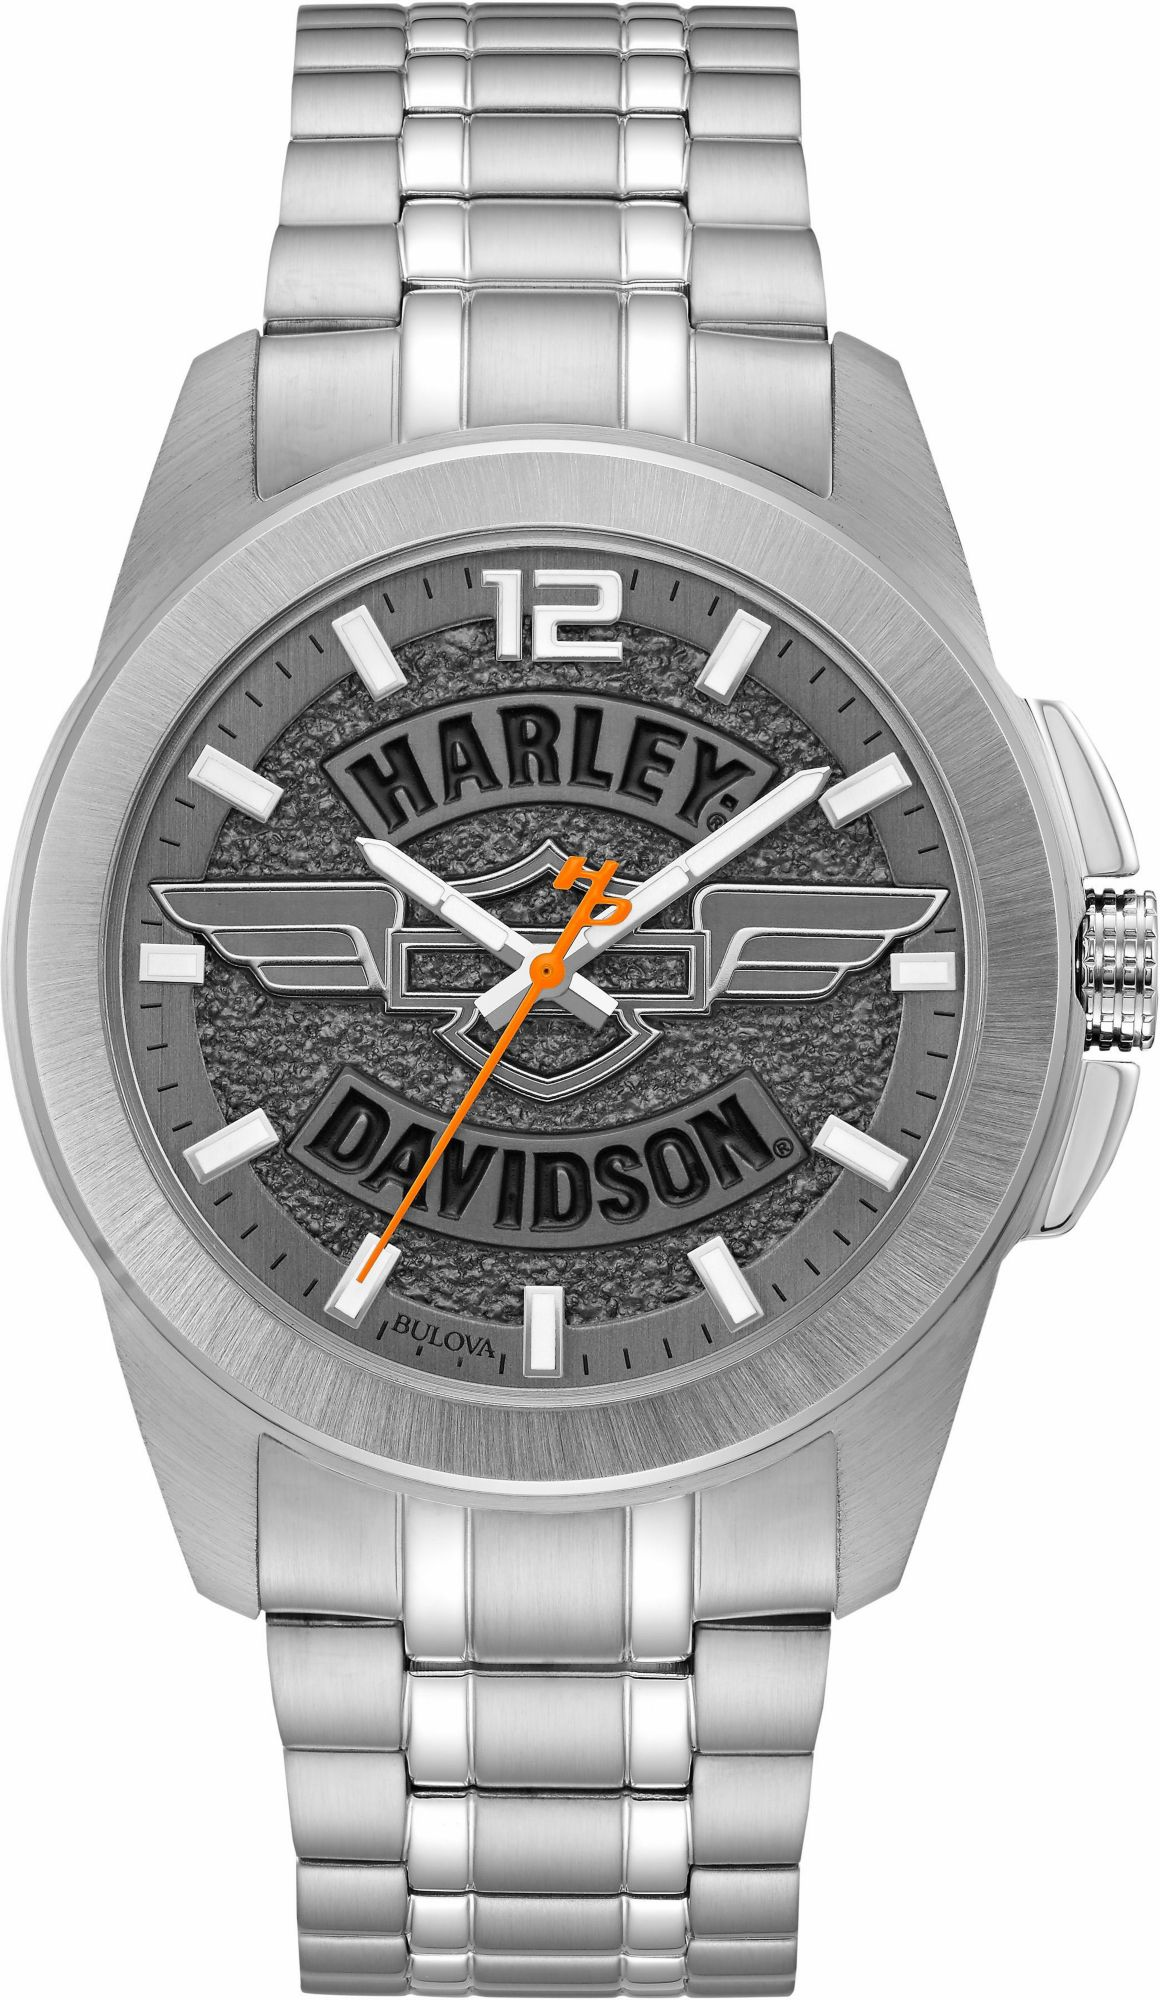 HARLEY DAVIDSON Harley Davidson Quarzuhr »Harley Davidson, 76A157«